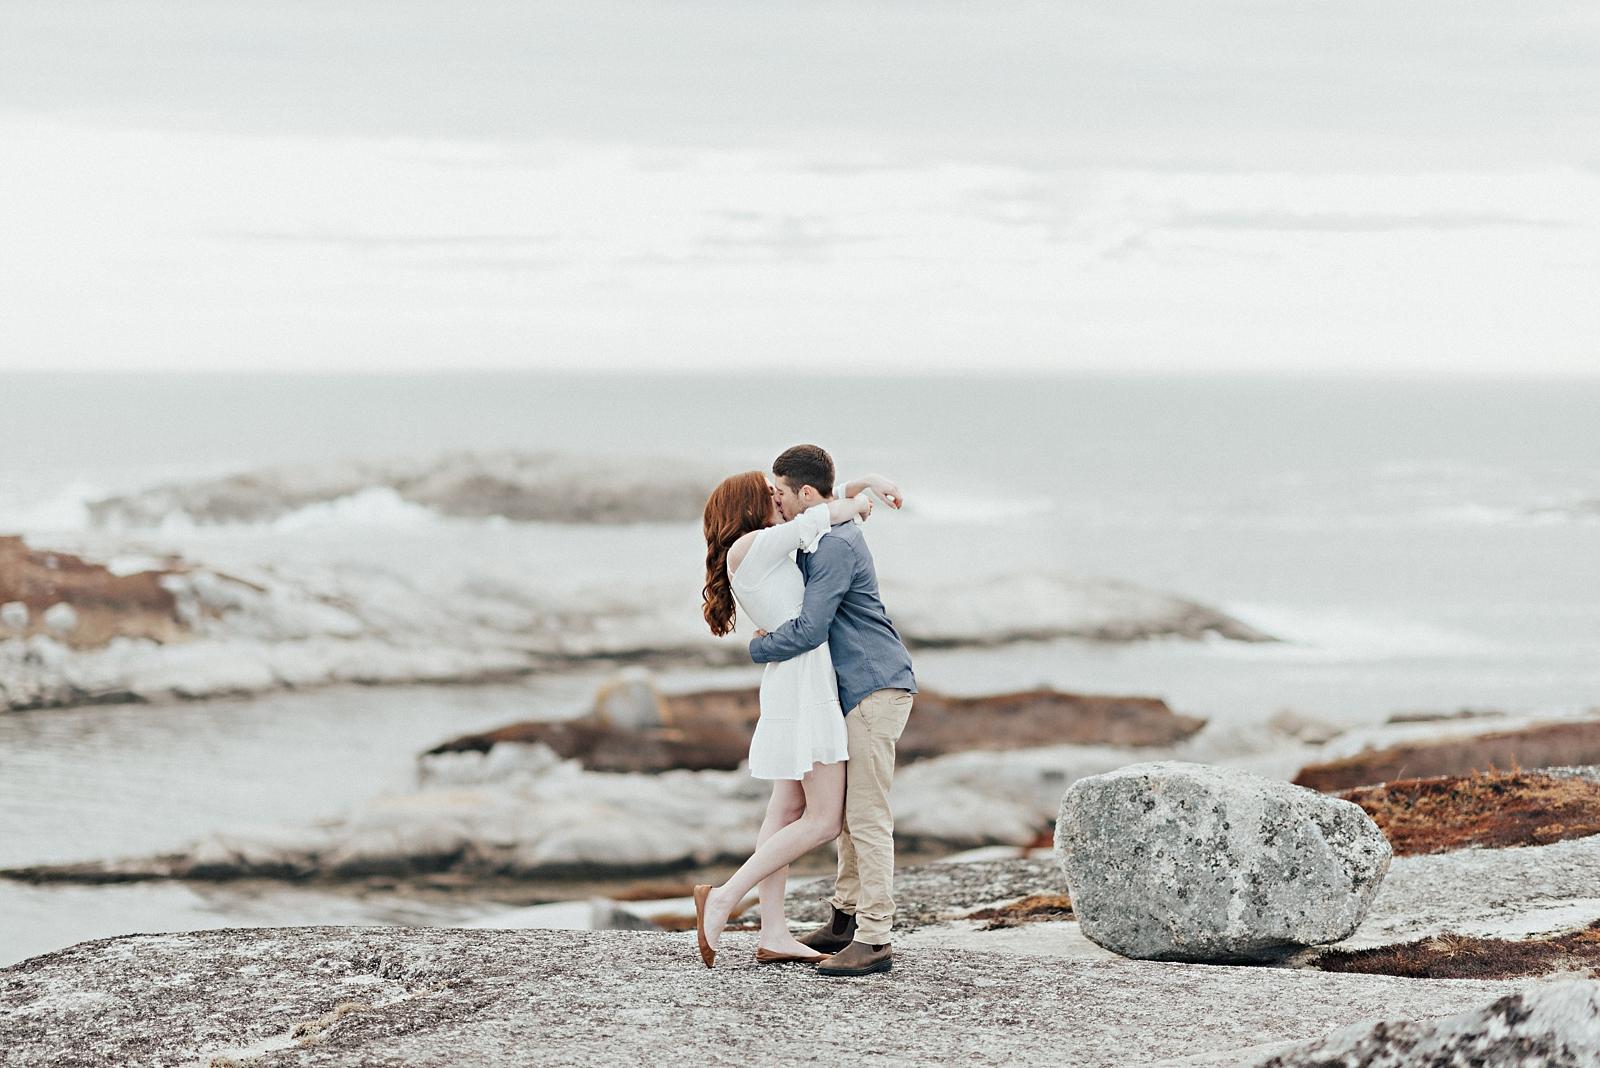 Halifax-Wedding-Photographer_Annie&Ryan_Ocean-Engagement-Shoot_19.jpg